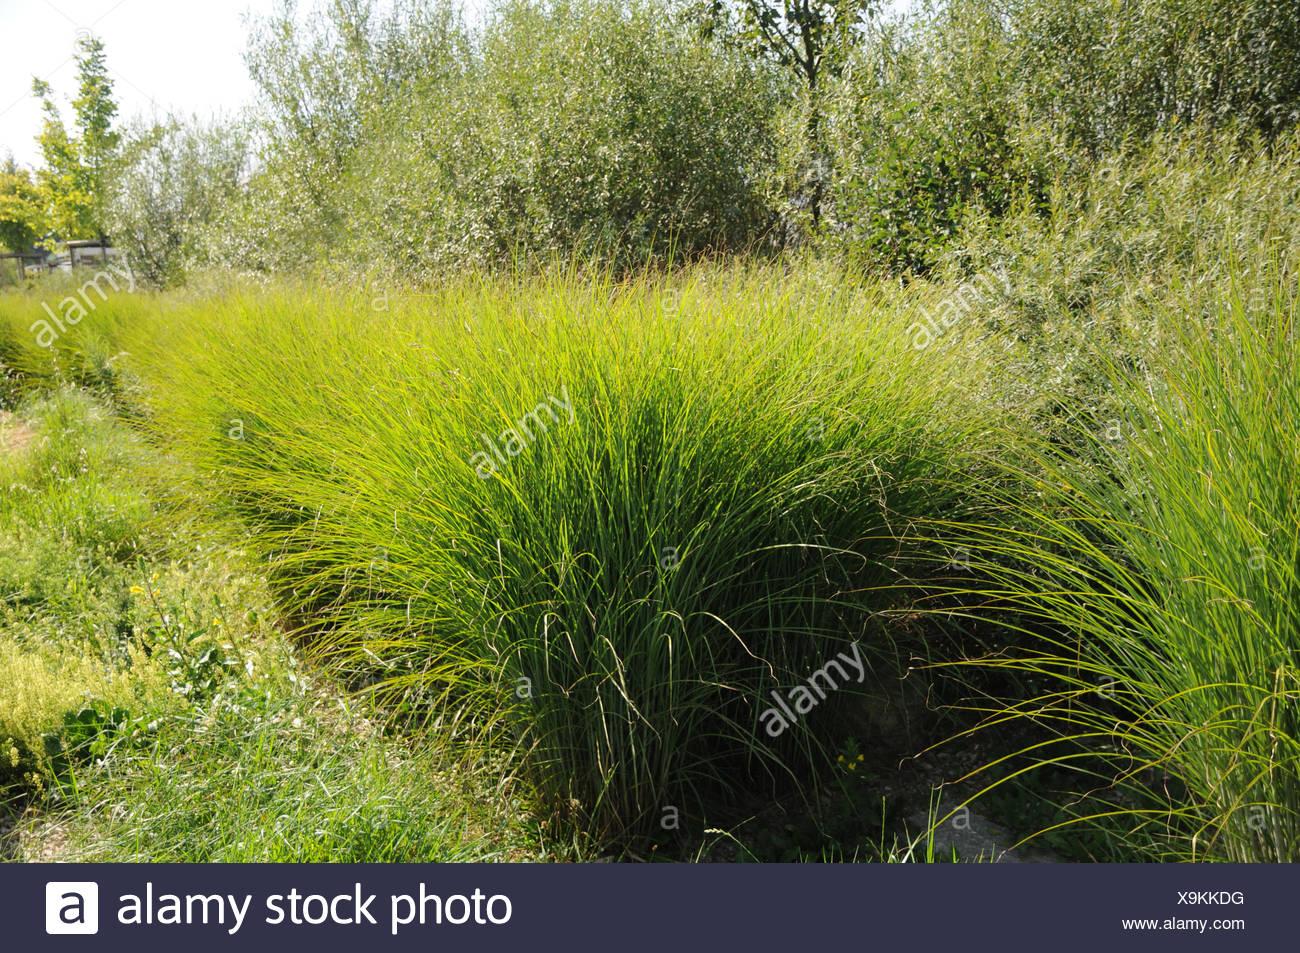 Chinese Silver Grass Stock Photo Alamy